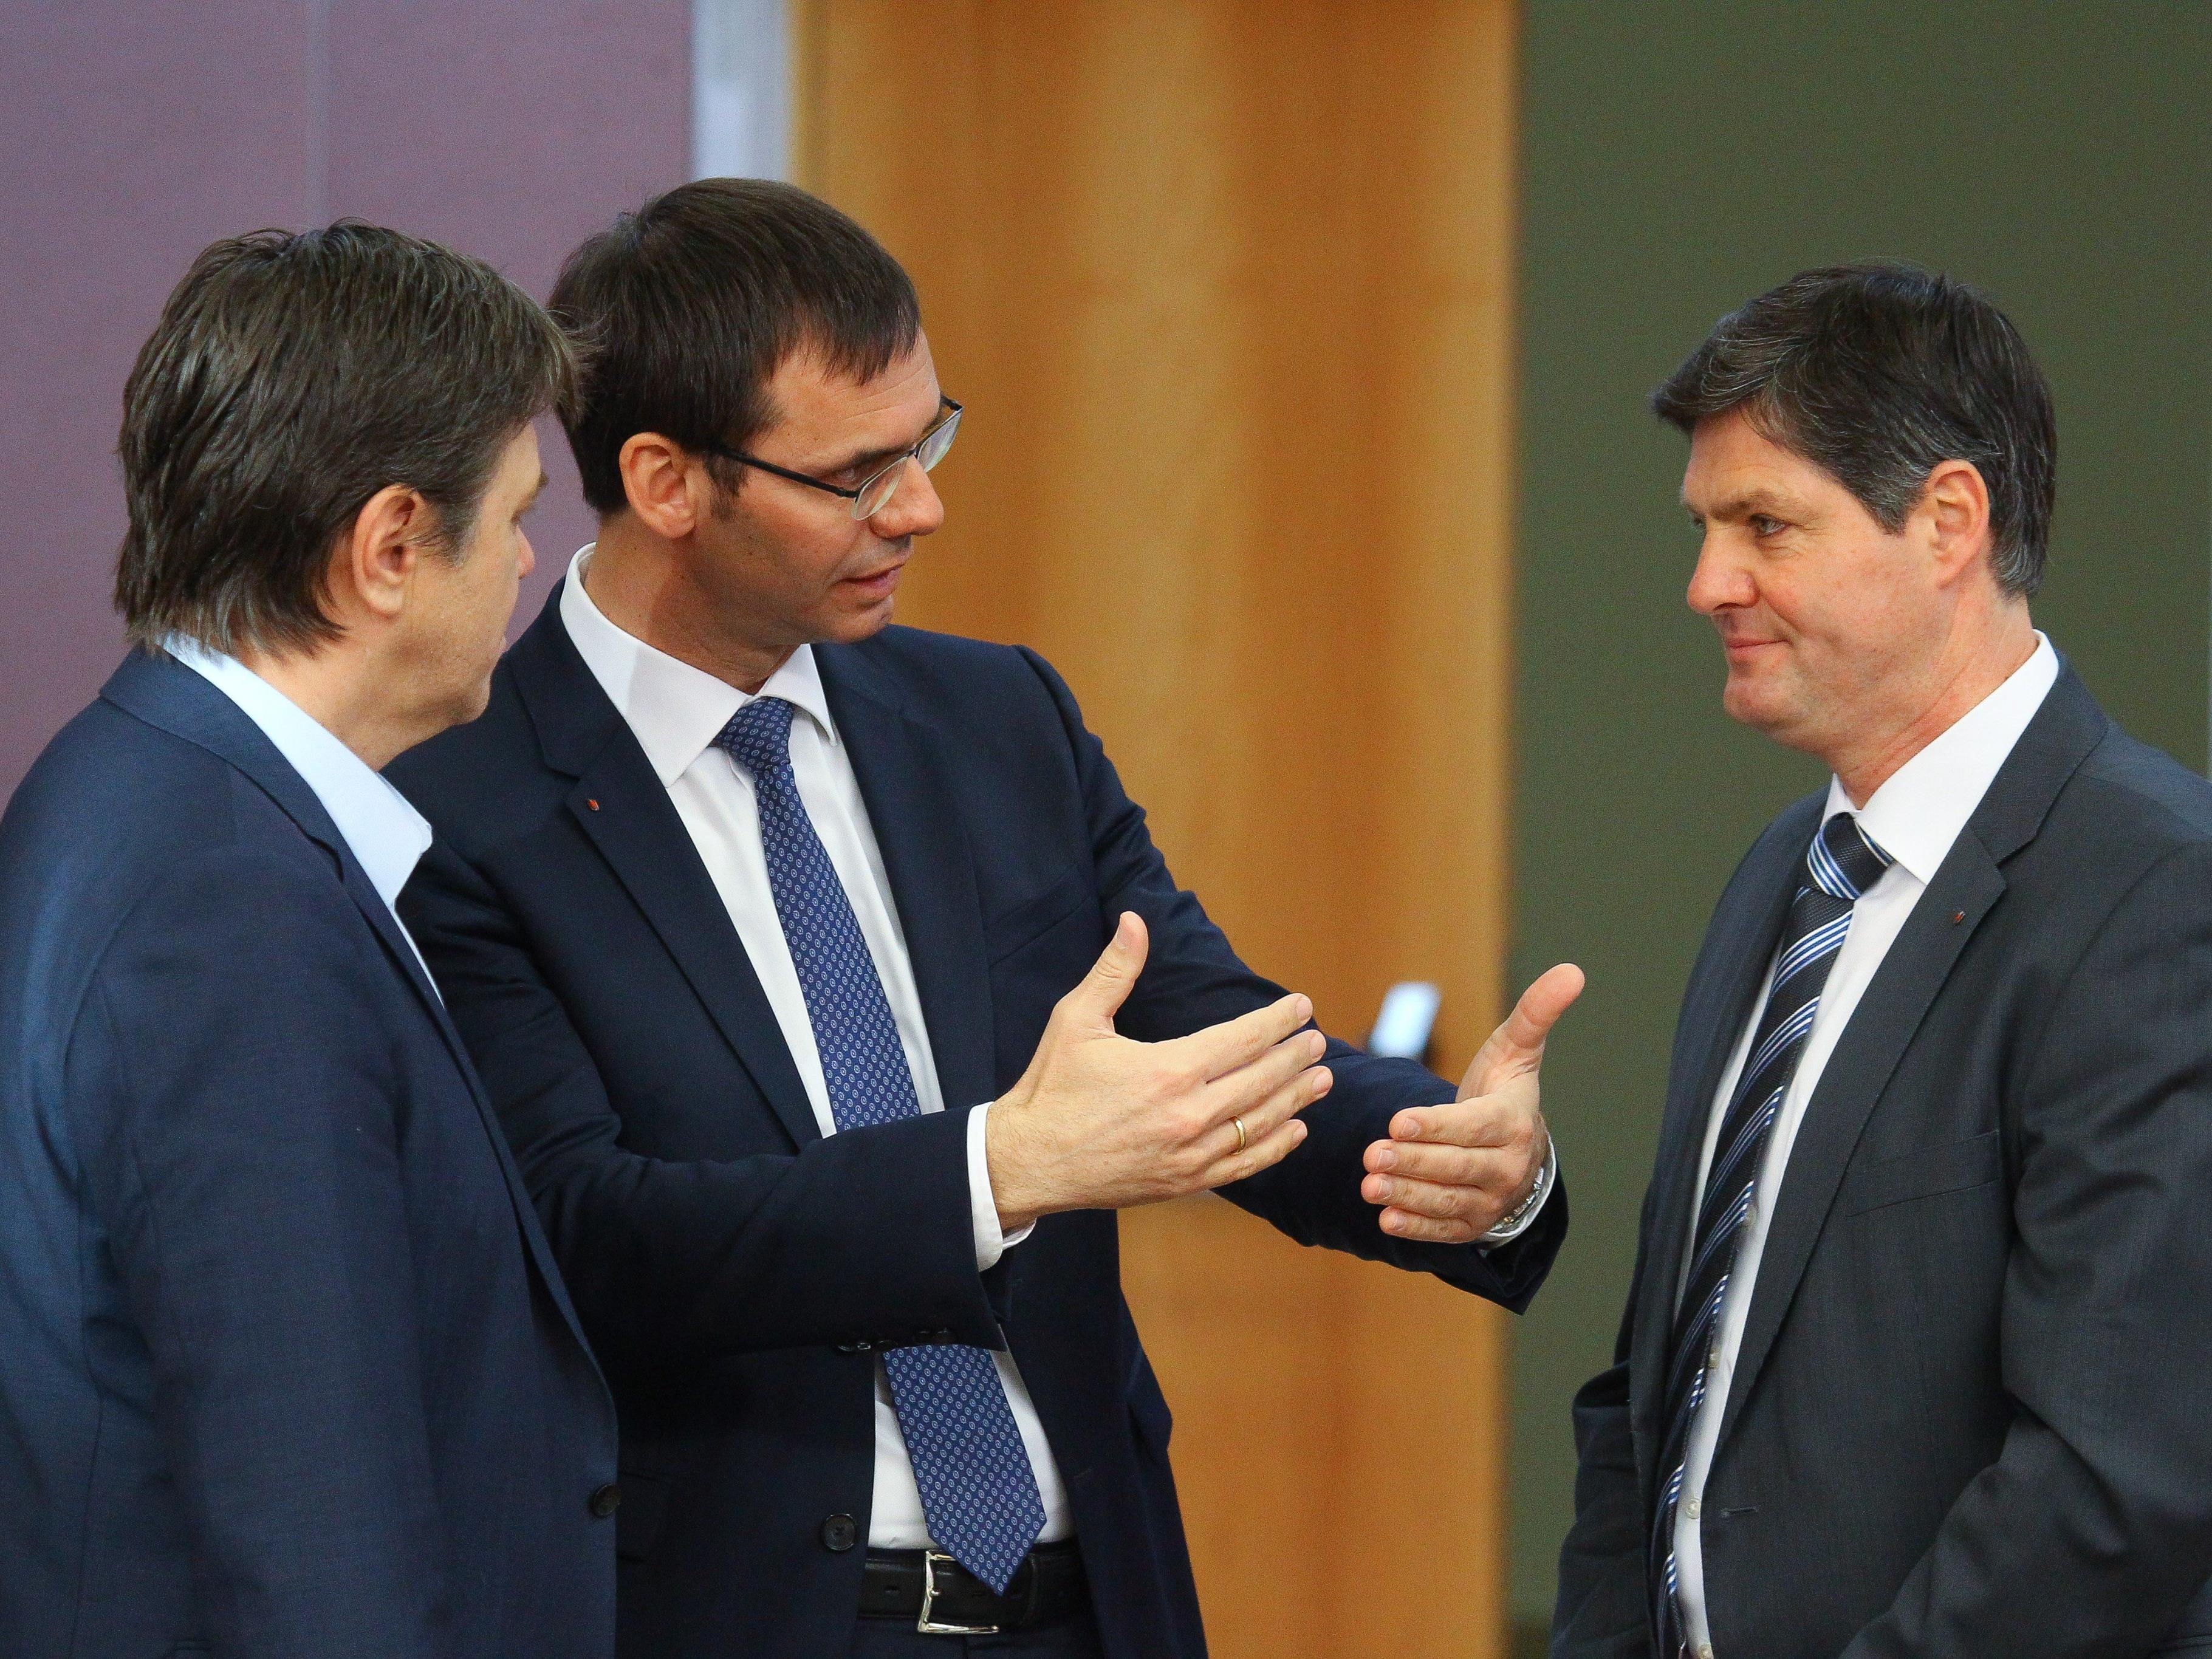 Allgäuer mit Kritik an Wallner.